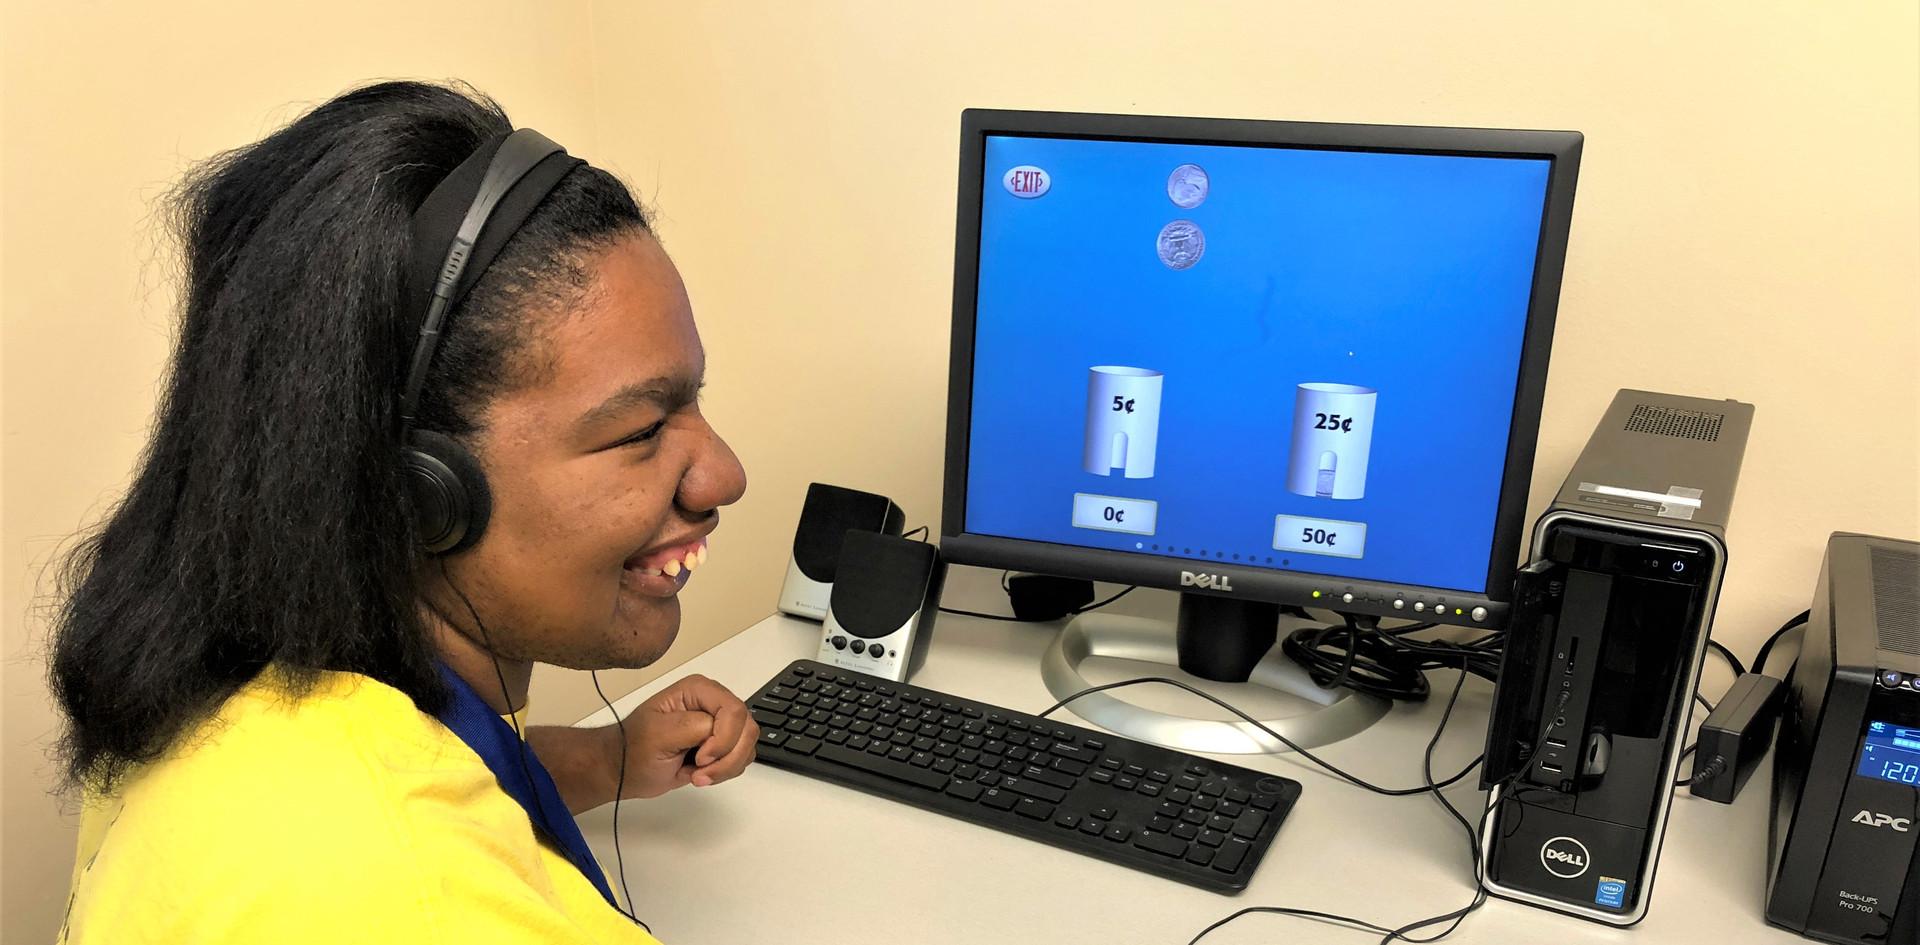 Angela computer Lab.jpg